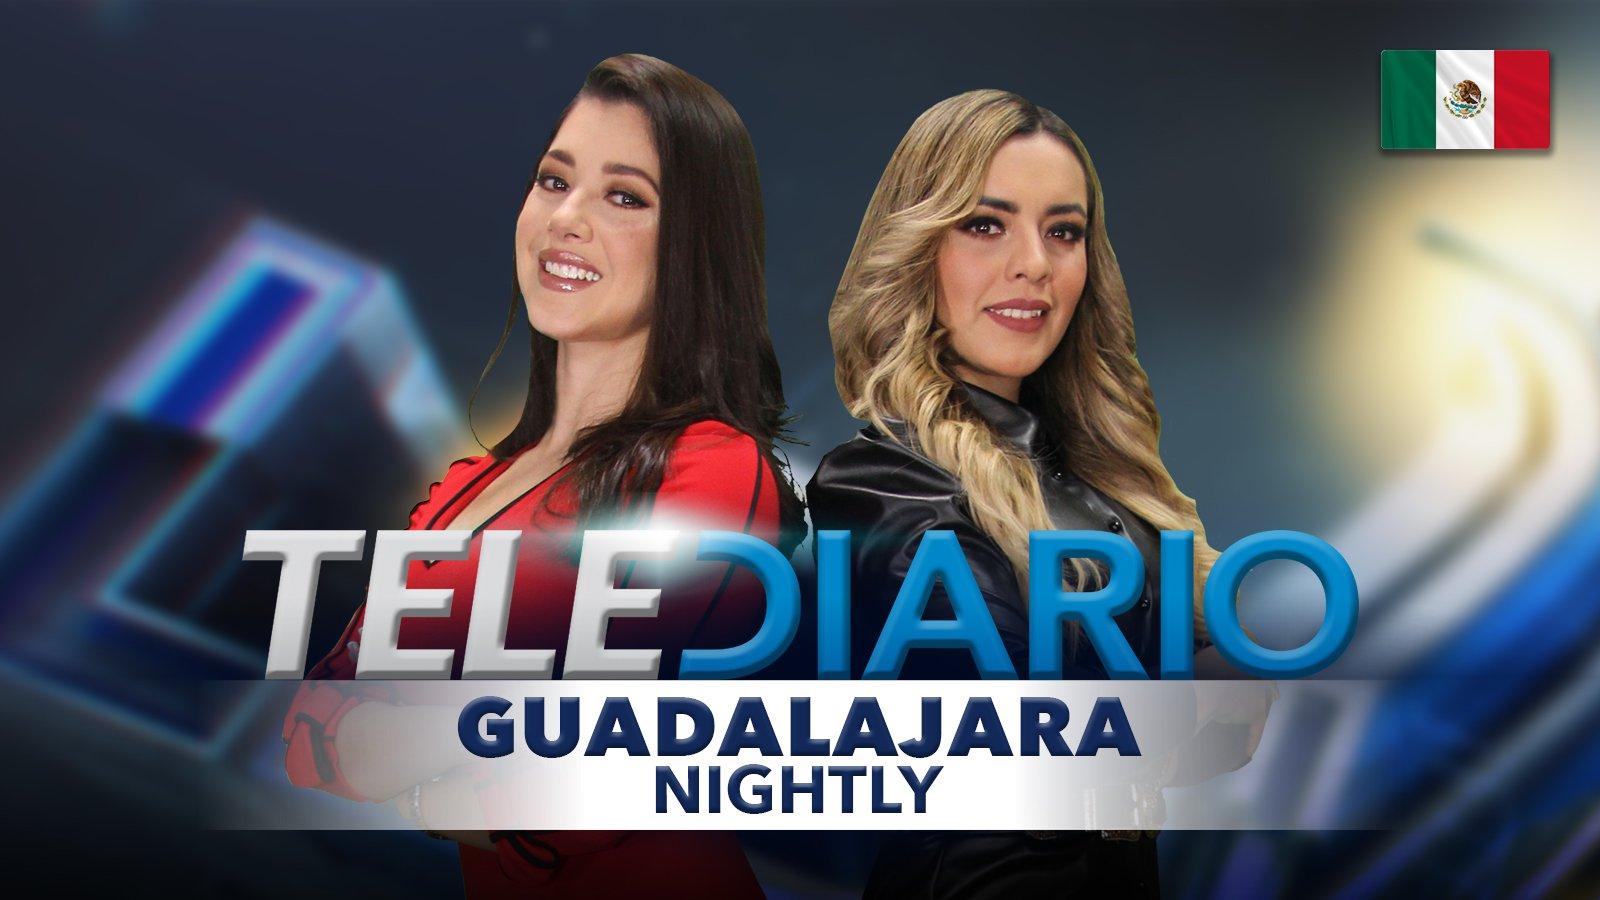 Nightly GDL Telediario poster